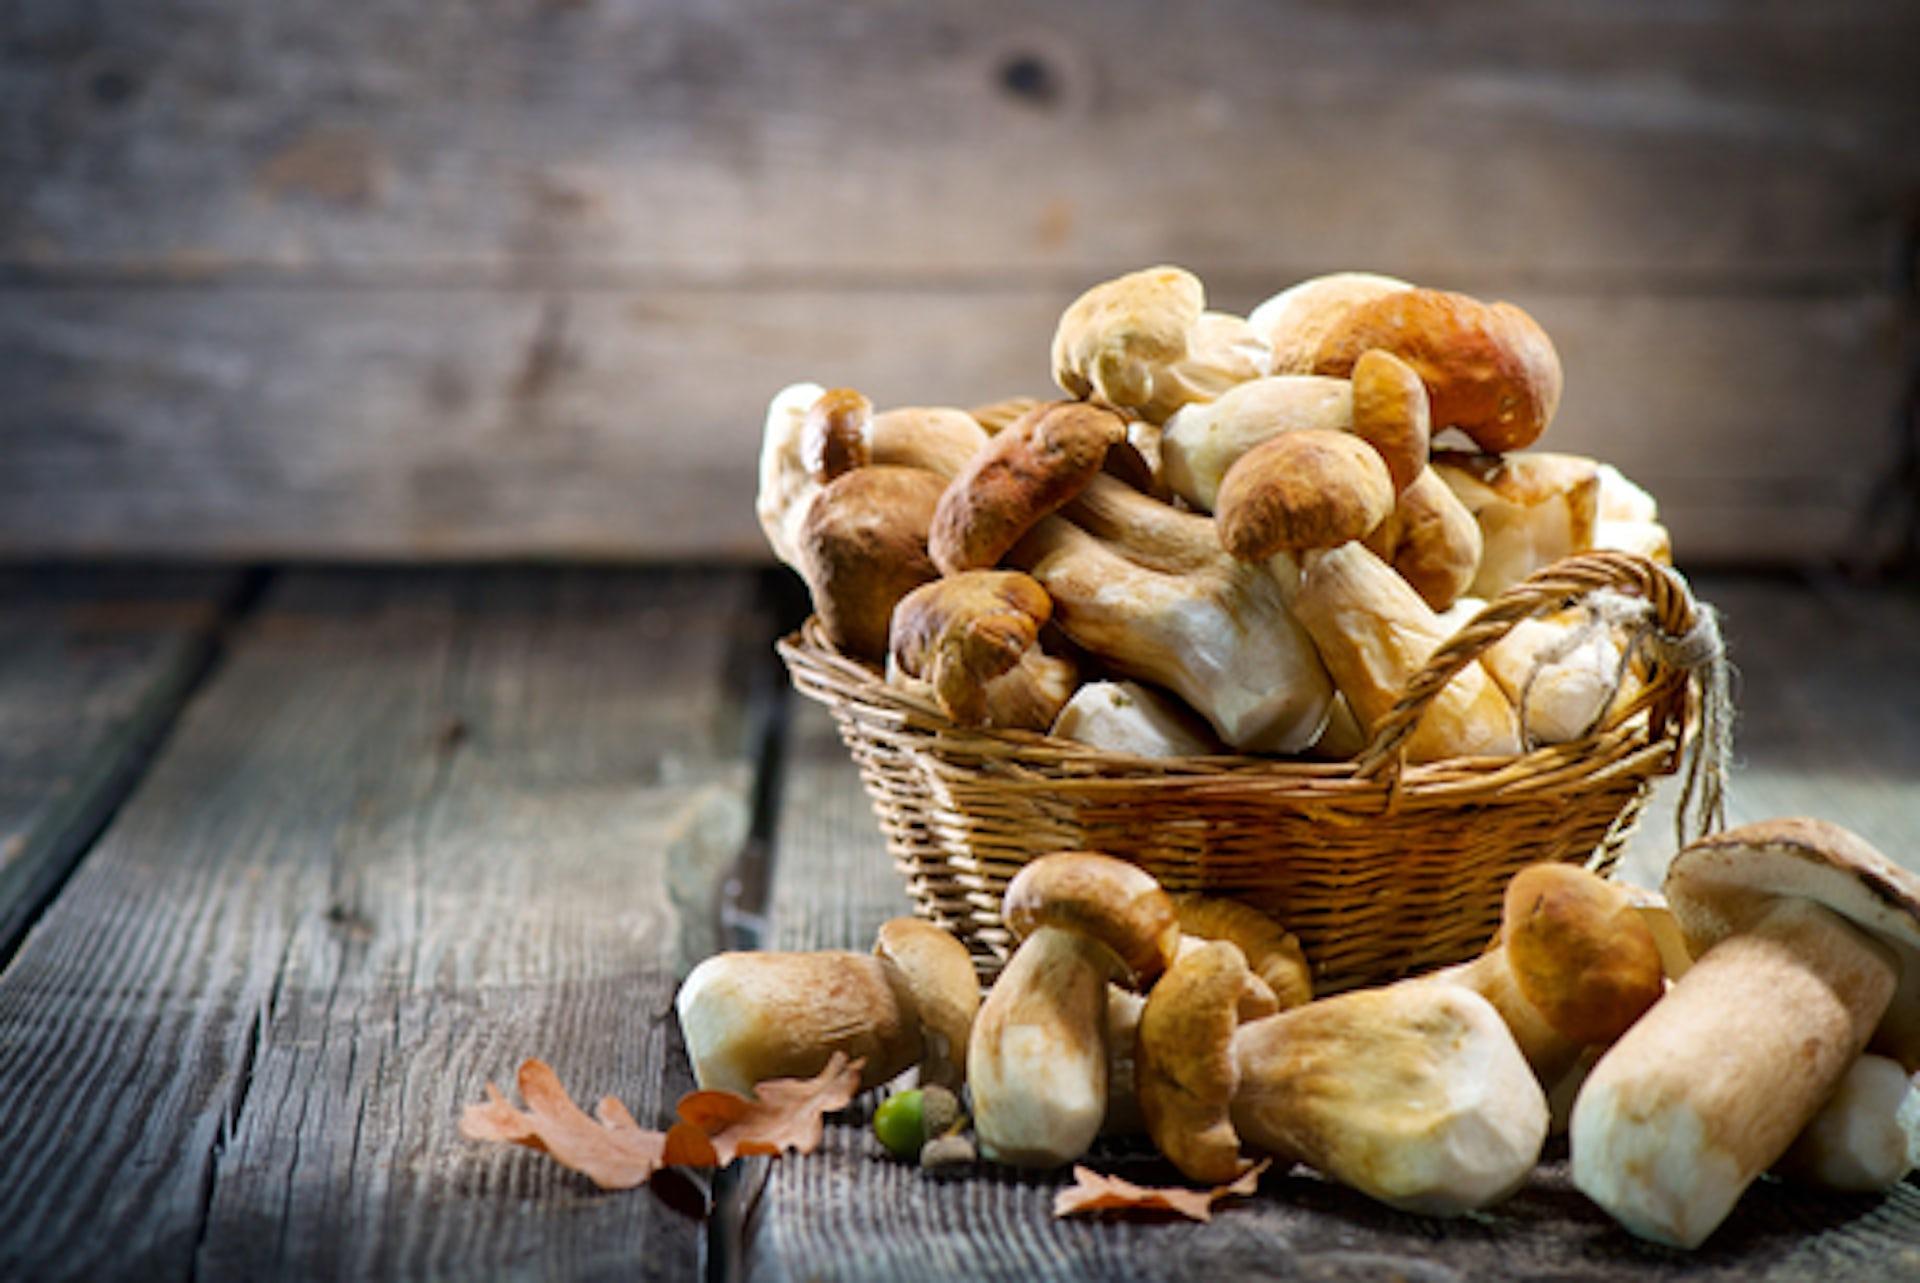 Canadian researchers use mushroom building blocks 94